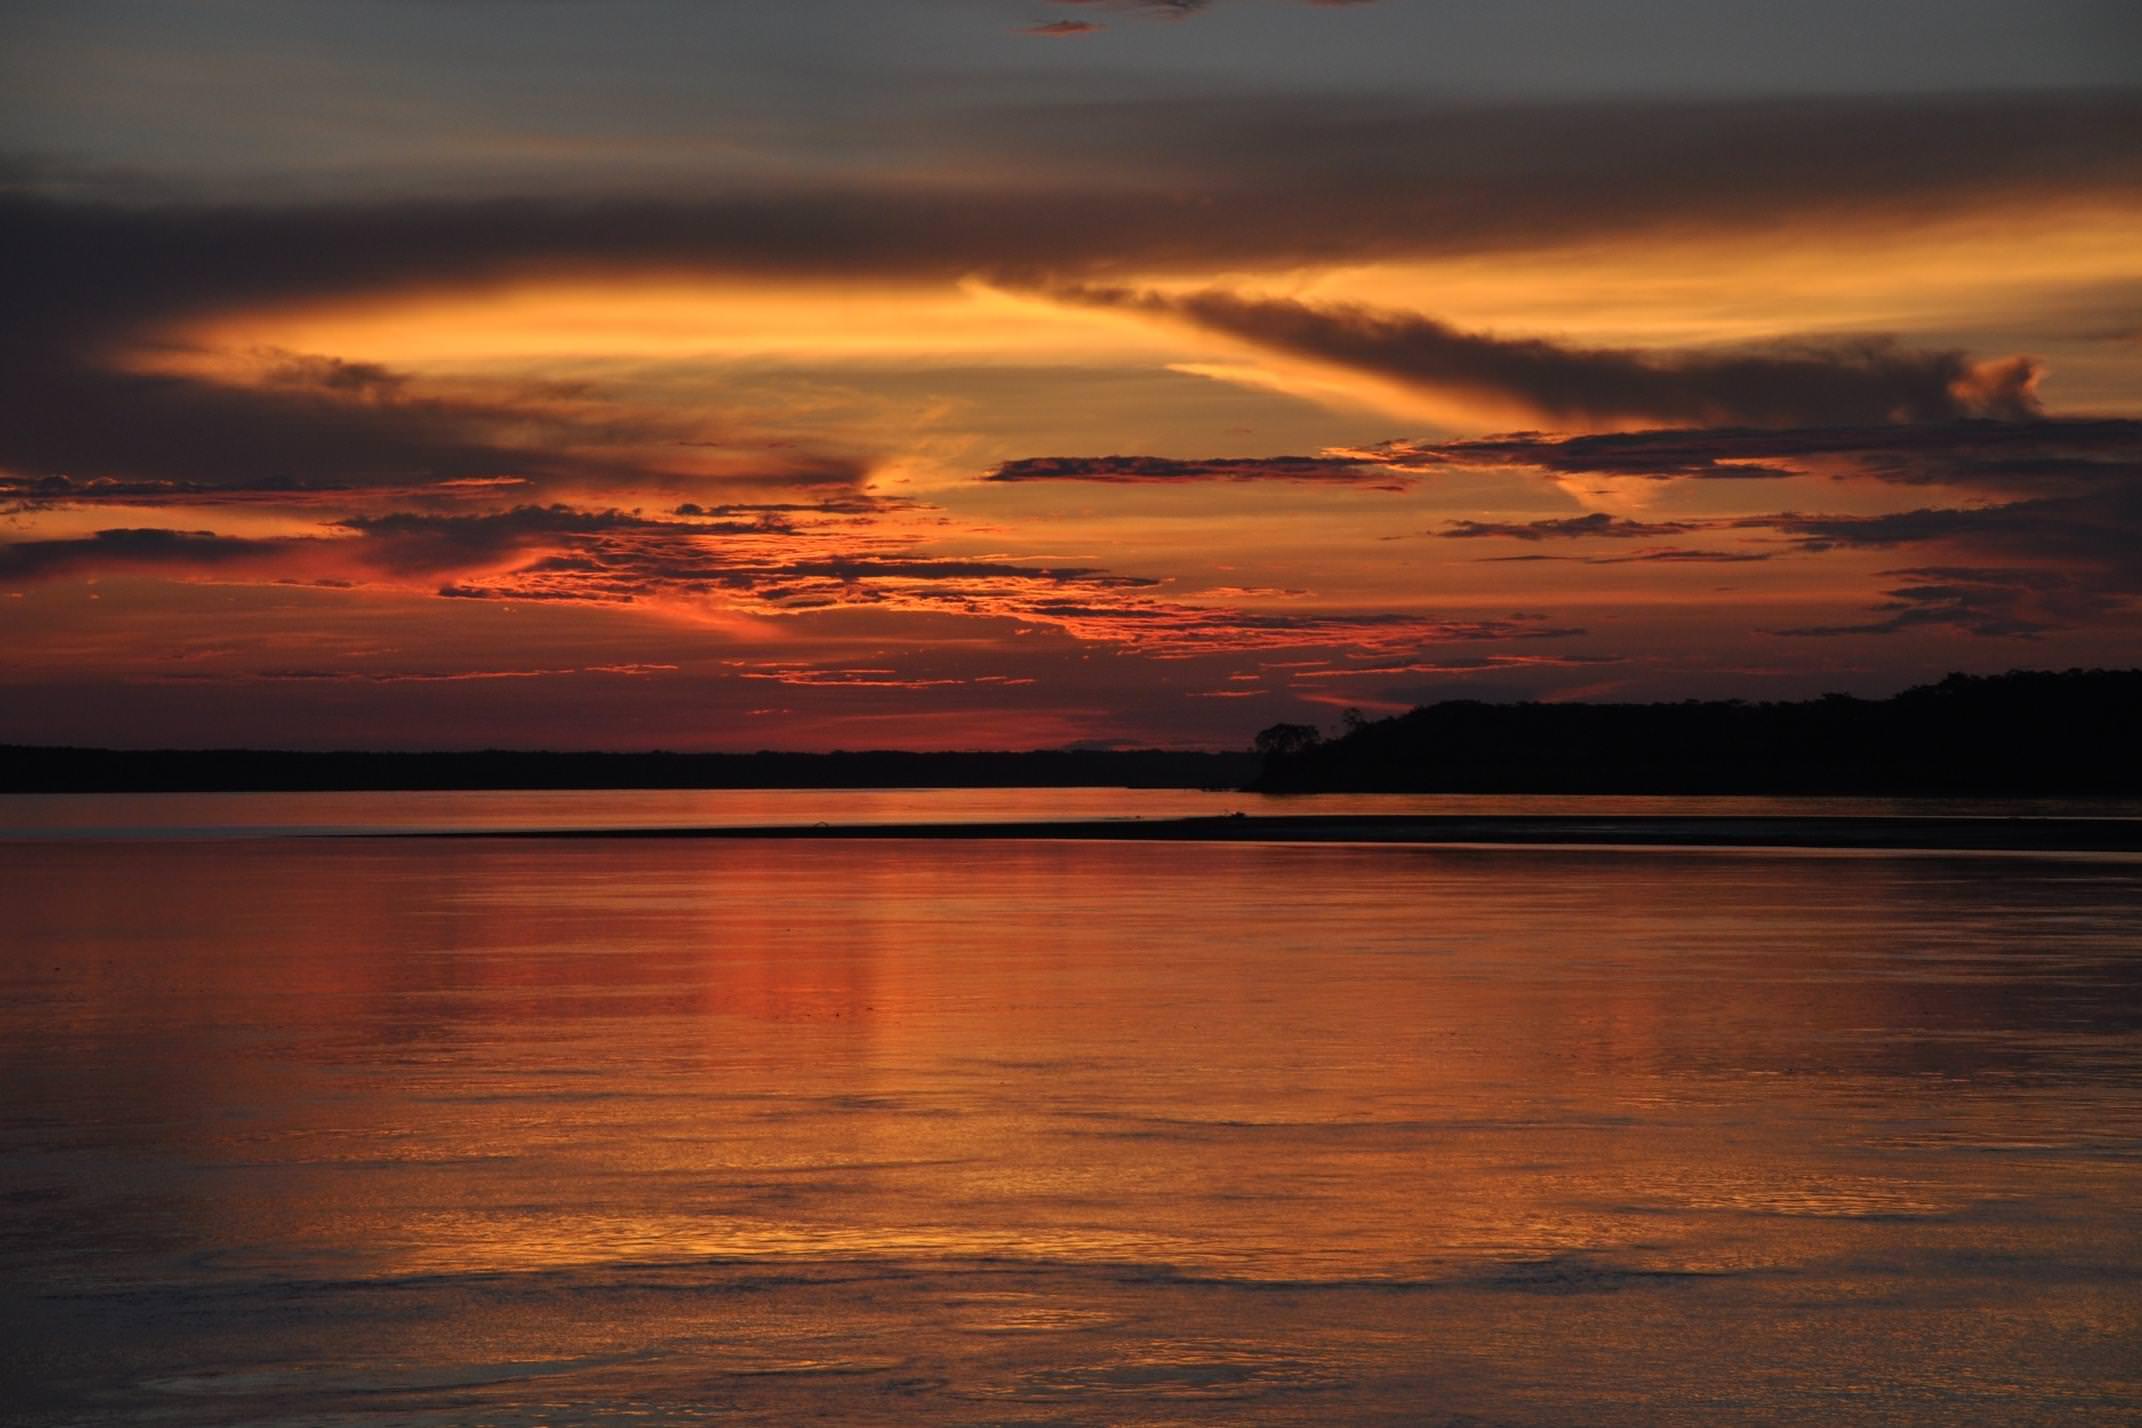 Peru amazon sunset over river